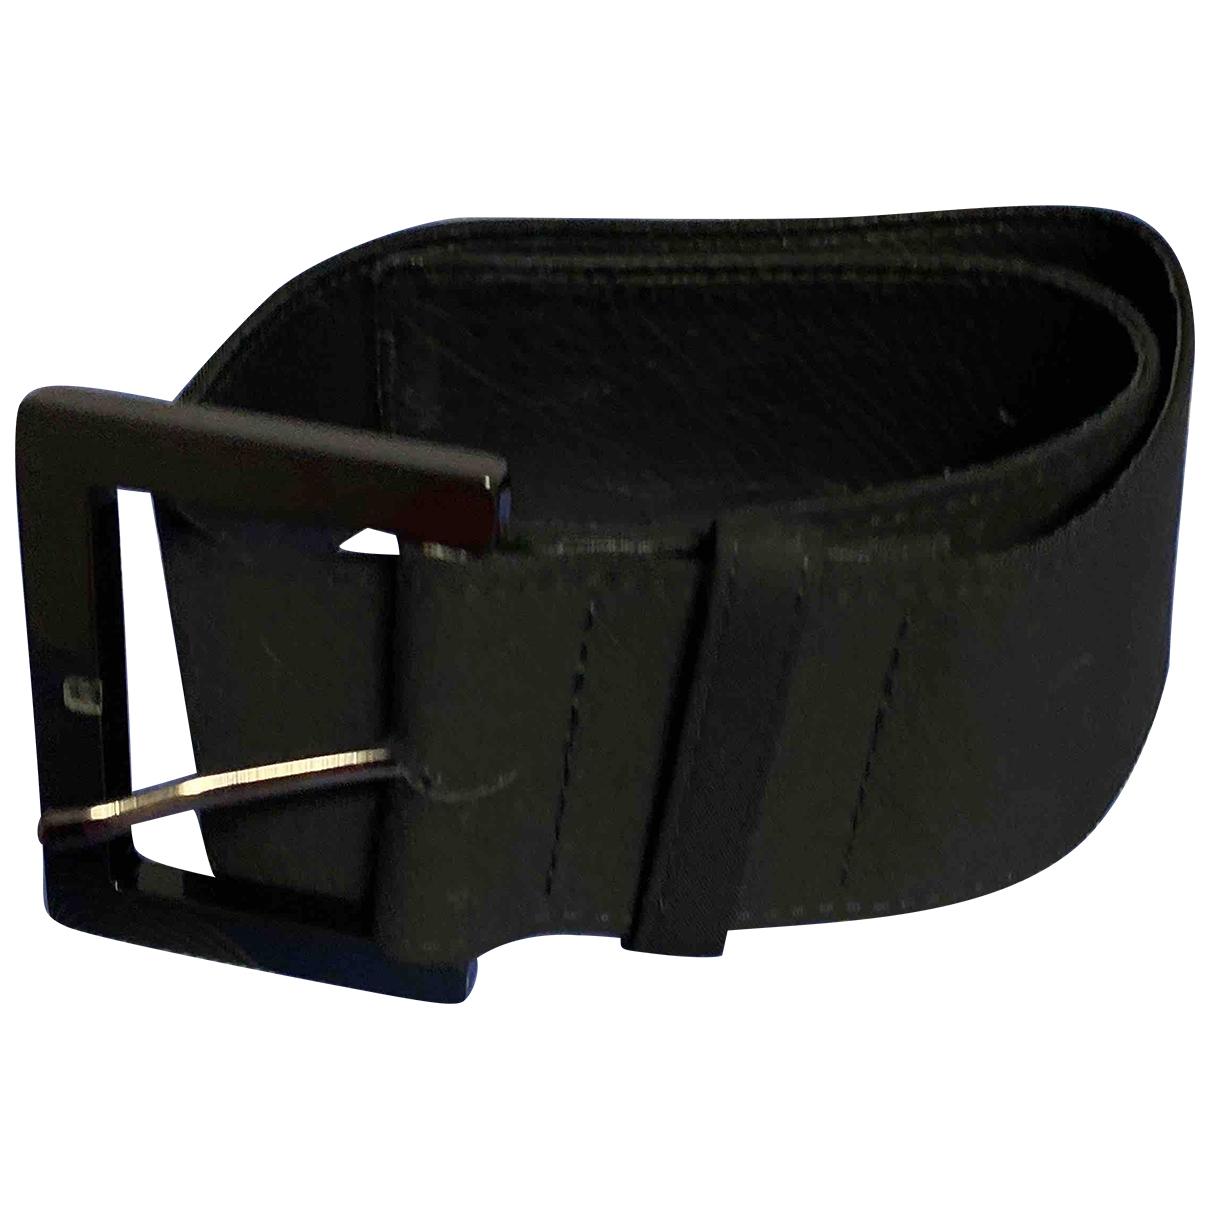 Donna Karan \N Black Leather belt for Women XS International